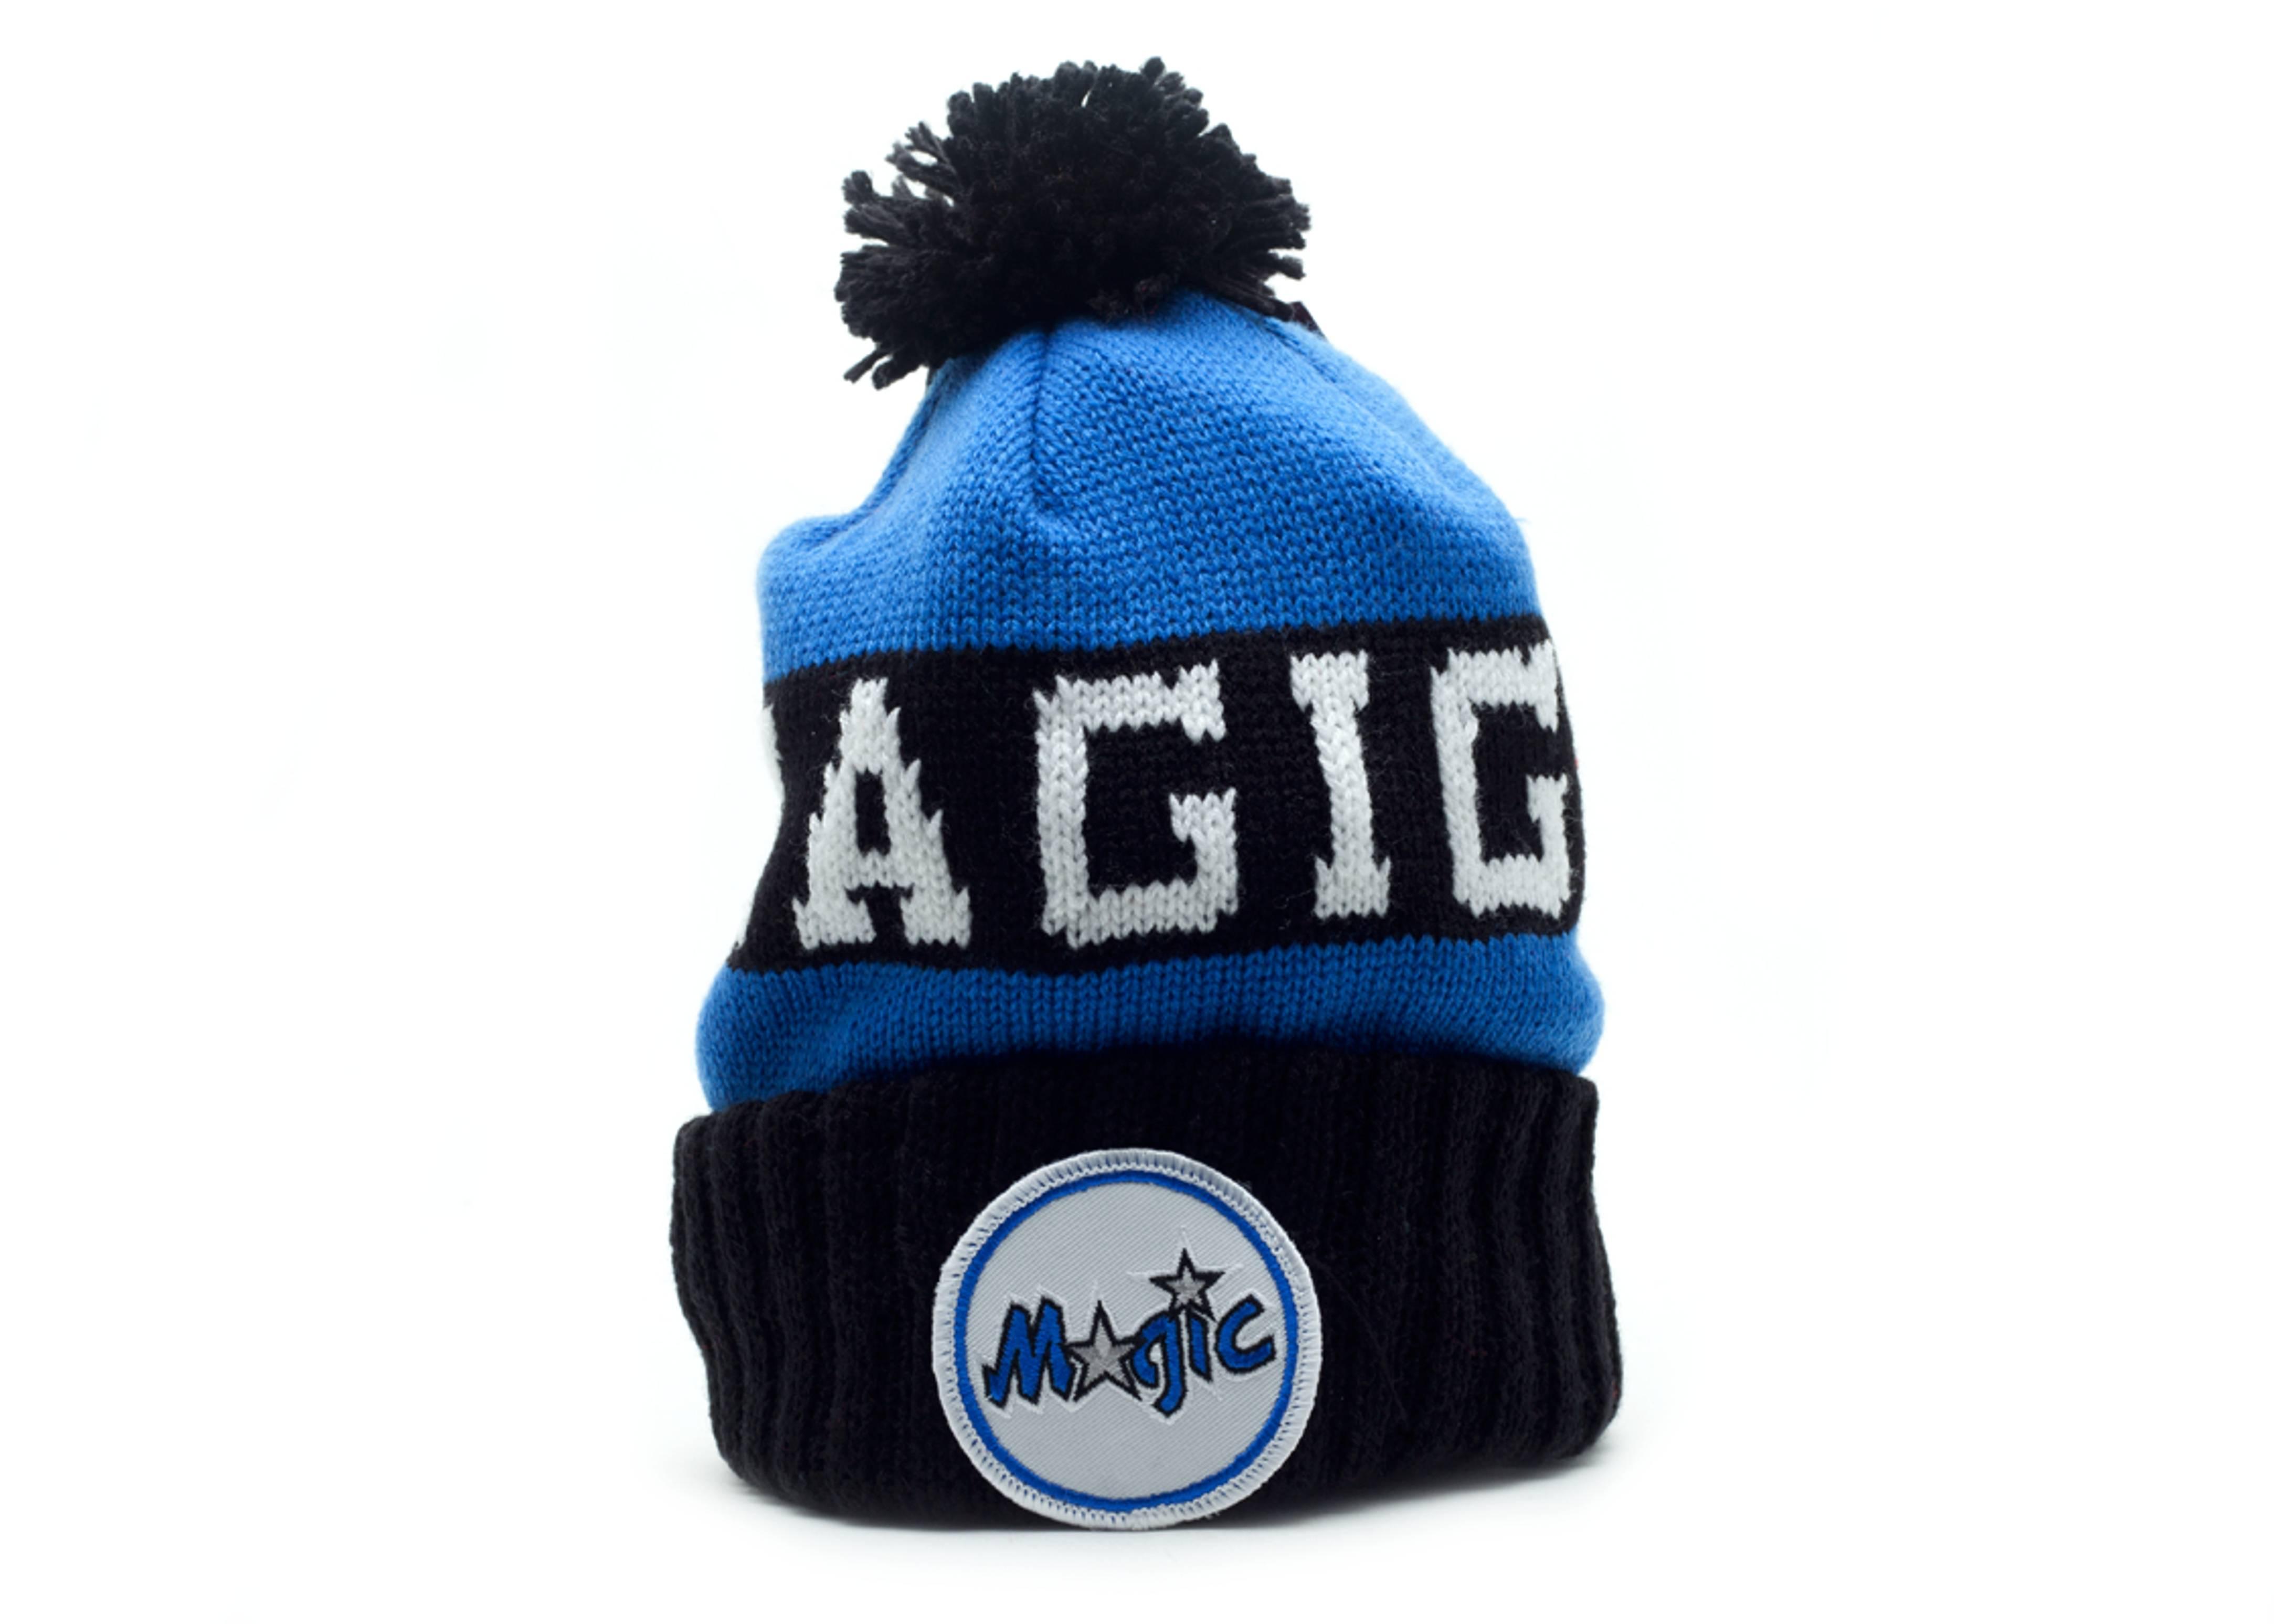 Orlando Magic Beanie - Mitchell   Ness - kd25mtc5magic - blue black ... 4d5be38517c